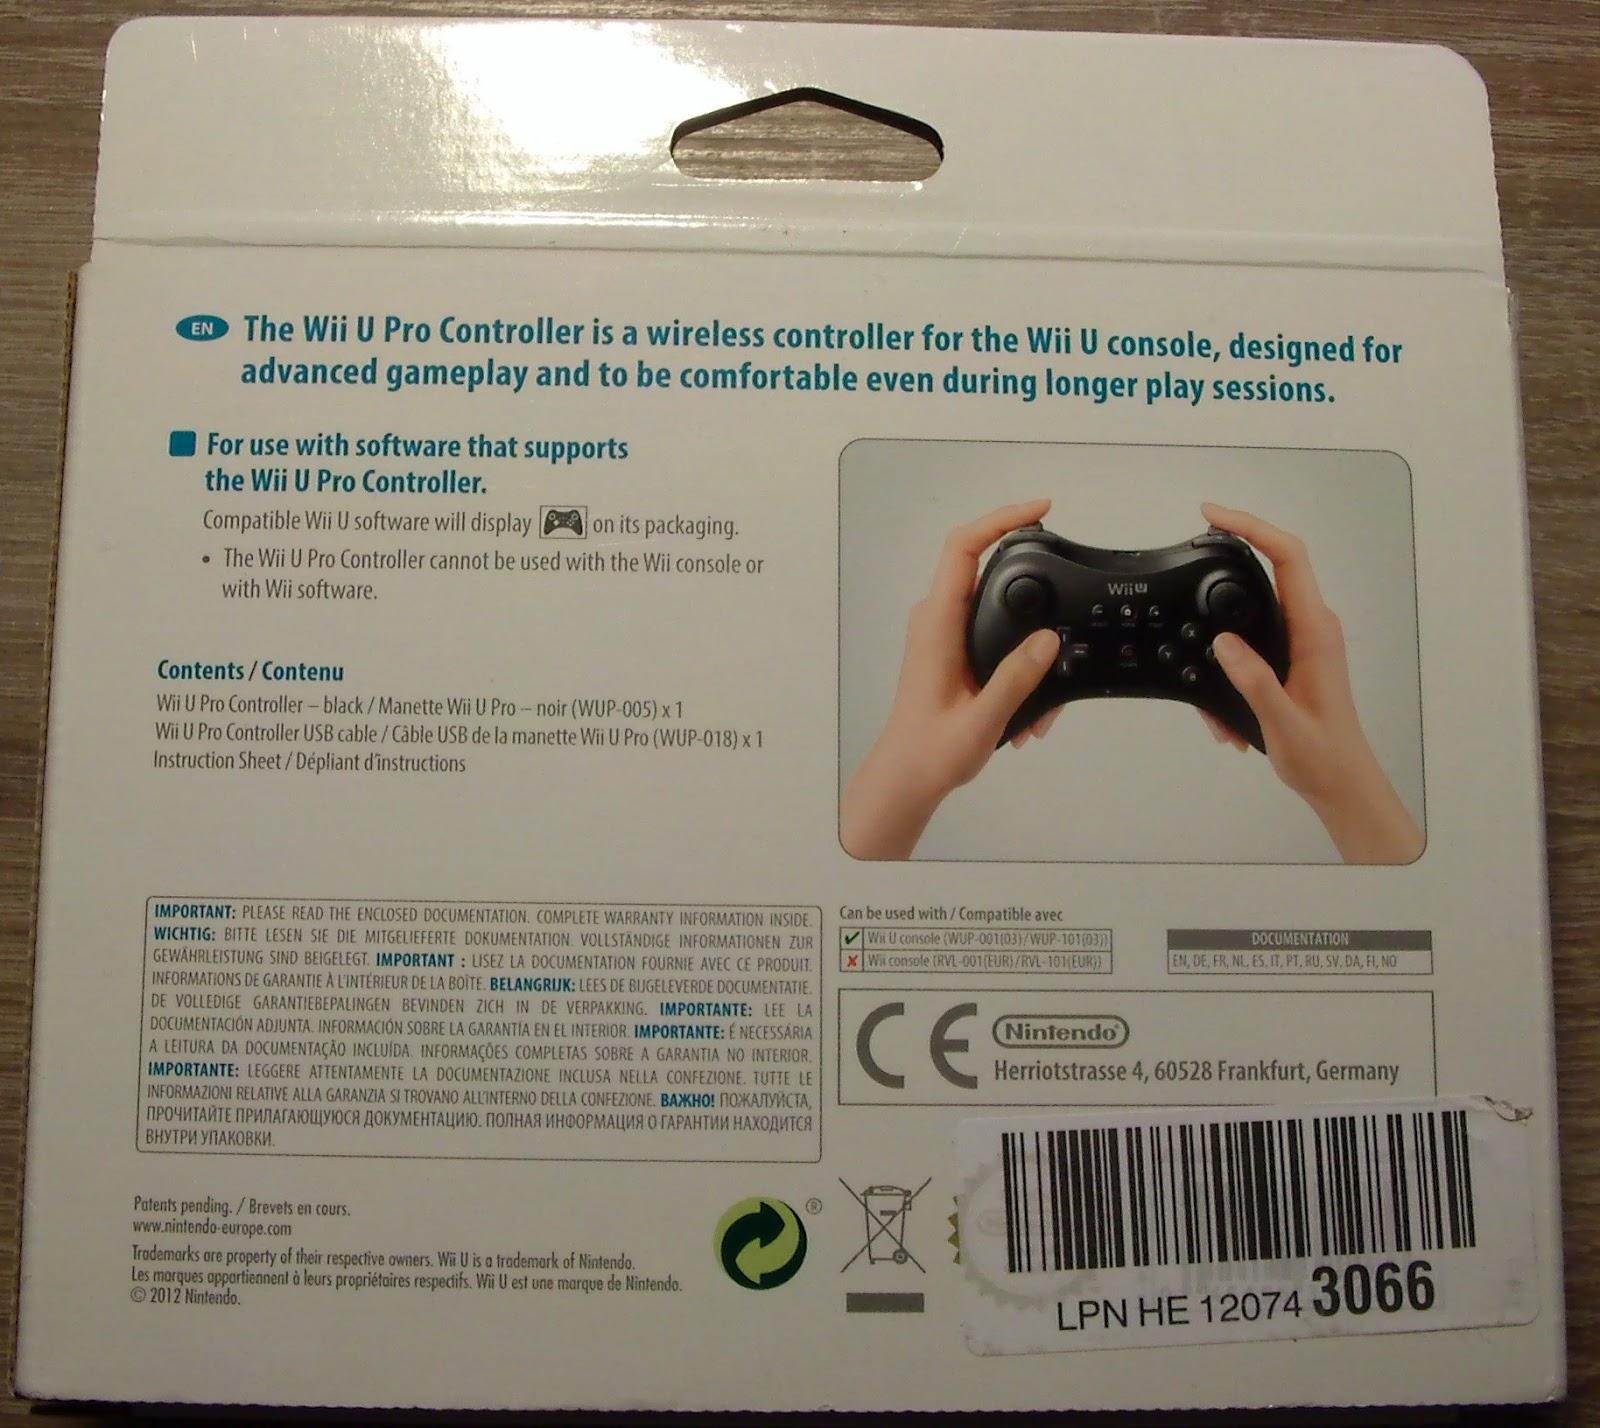 Beyond Consoles: Wii U Pro Controller Review (Nintendo)